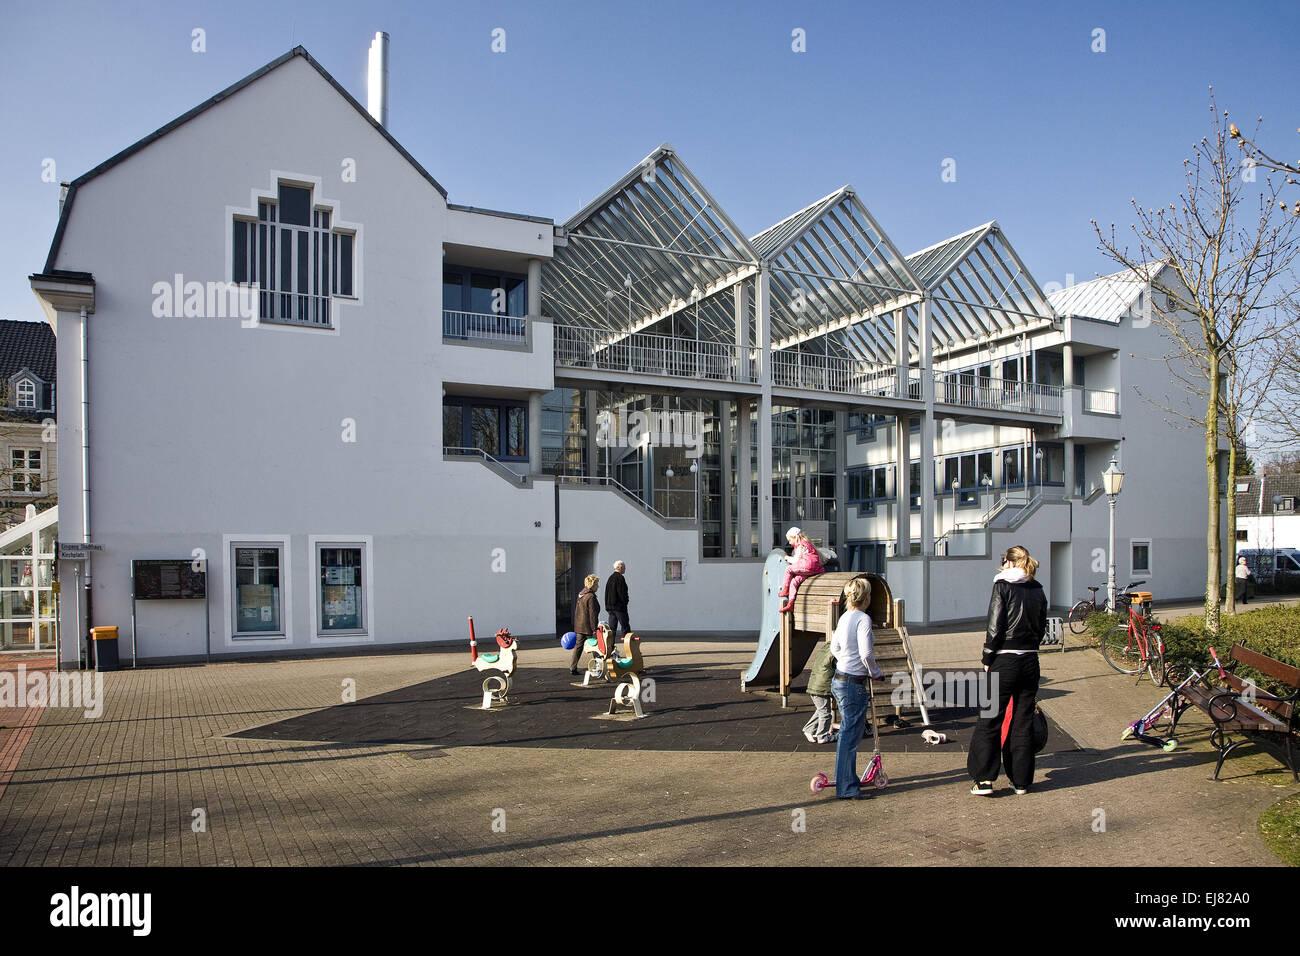 Townhouse, Rheinberg, Germany - Stock Image